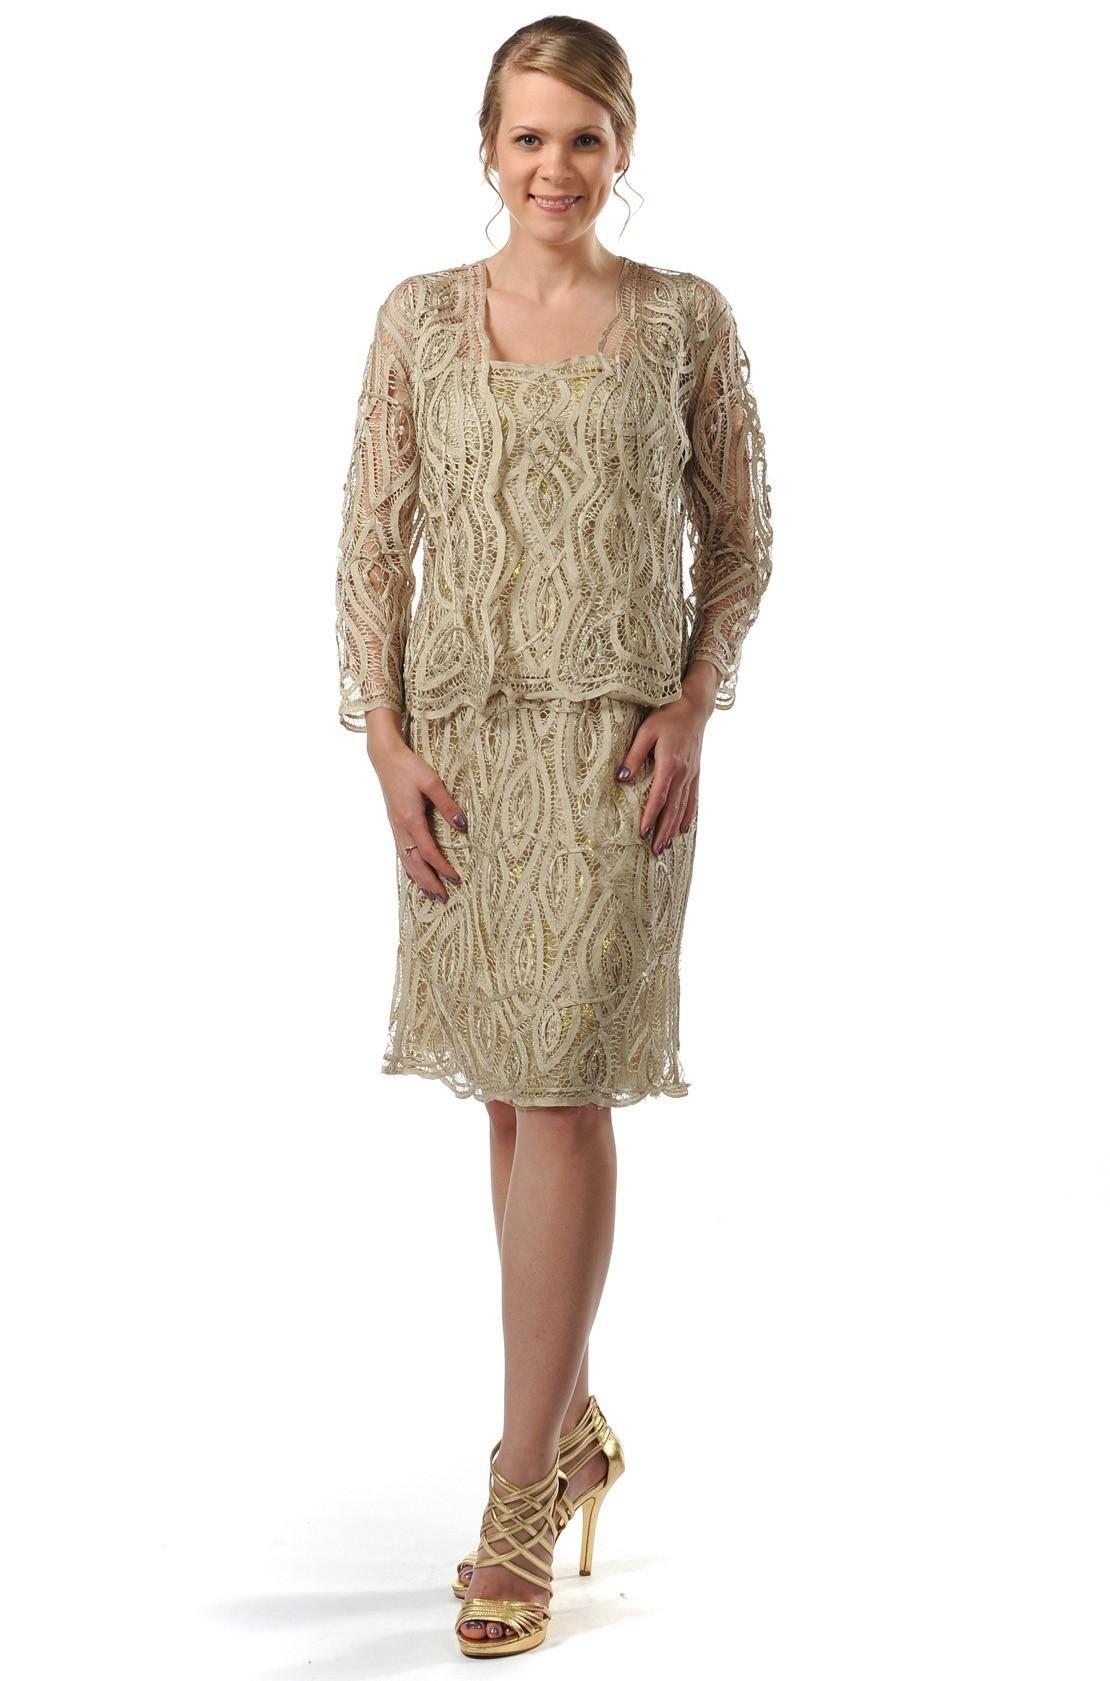 Plus size jacket dress for wedding  Soulmates D Crochet Beaded Silk Lace Knee Length  pc Jacket